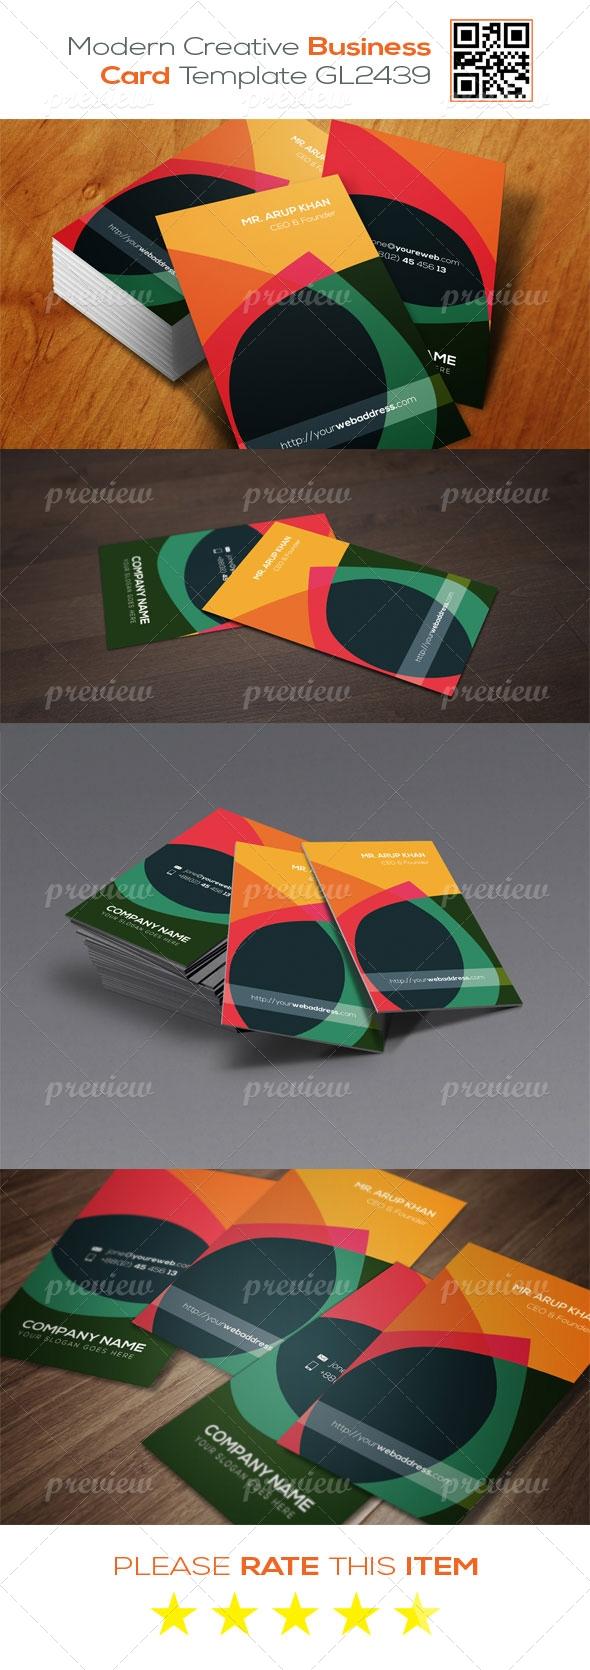 Modern Creative Business Card Template GL2439